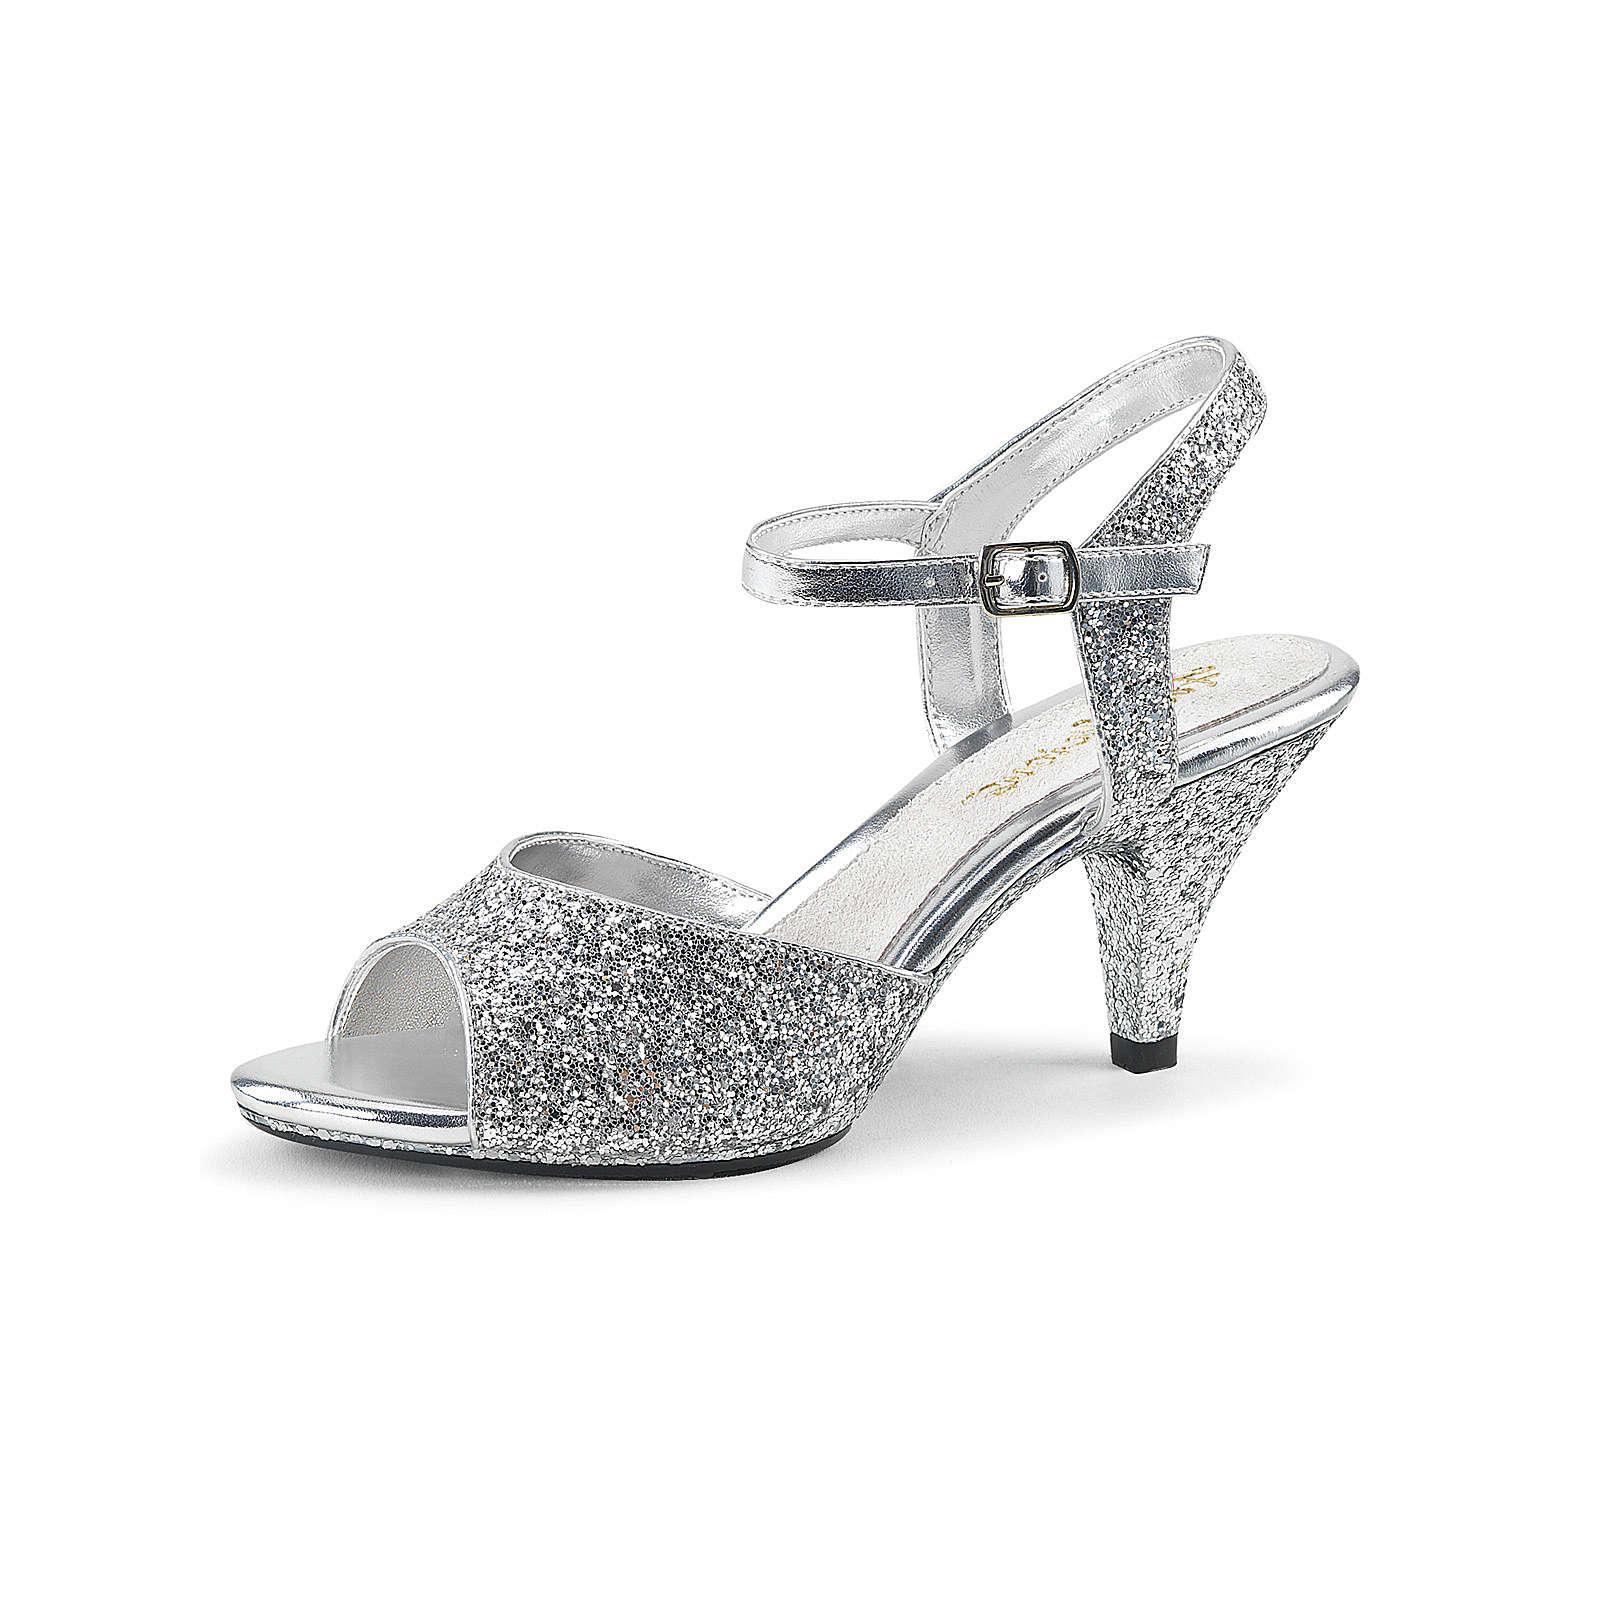 Fabulicious™ Glitzer Sandaletten Belle Riemchensandalen Silber Damen Gr. 39